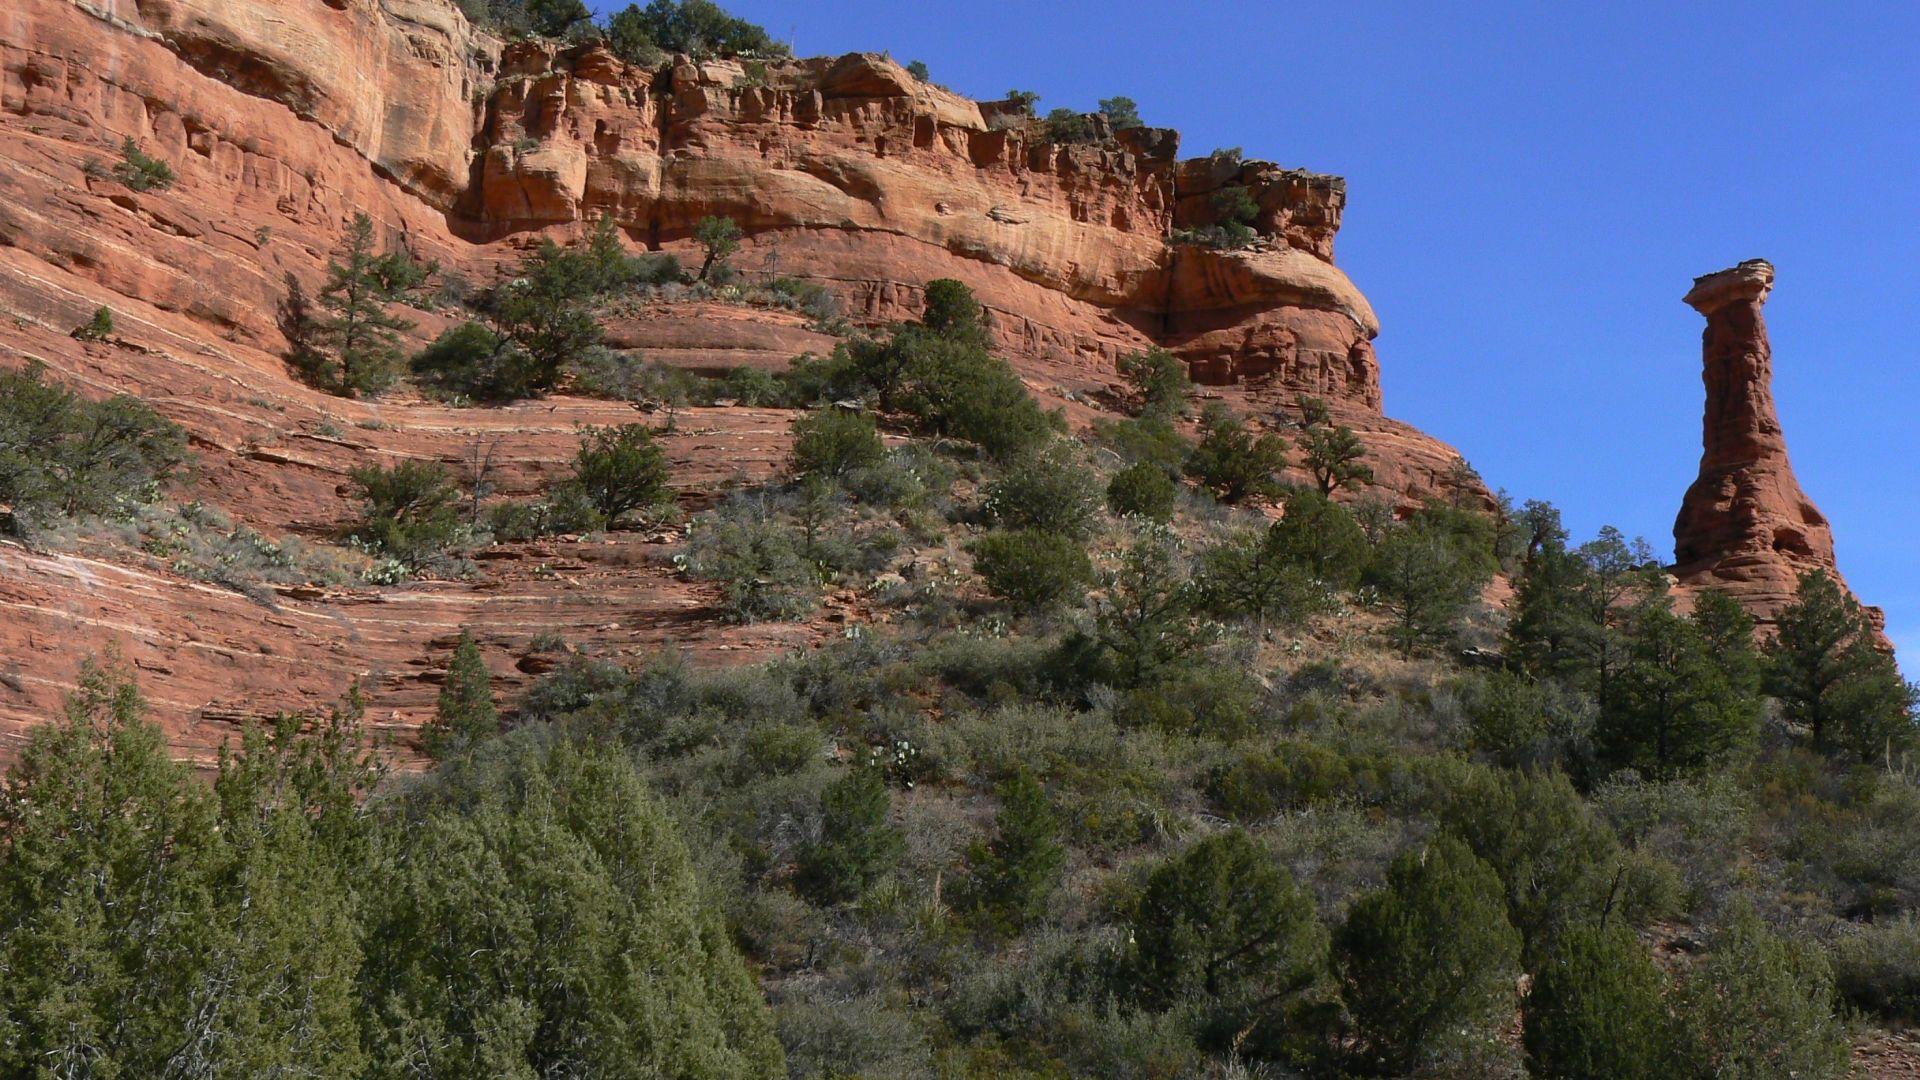 Boynton Canyon Trail in Sedona